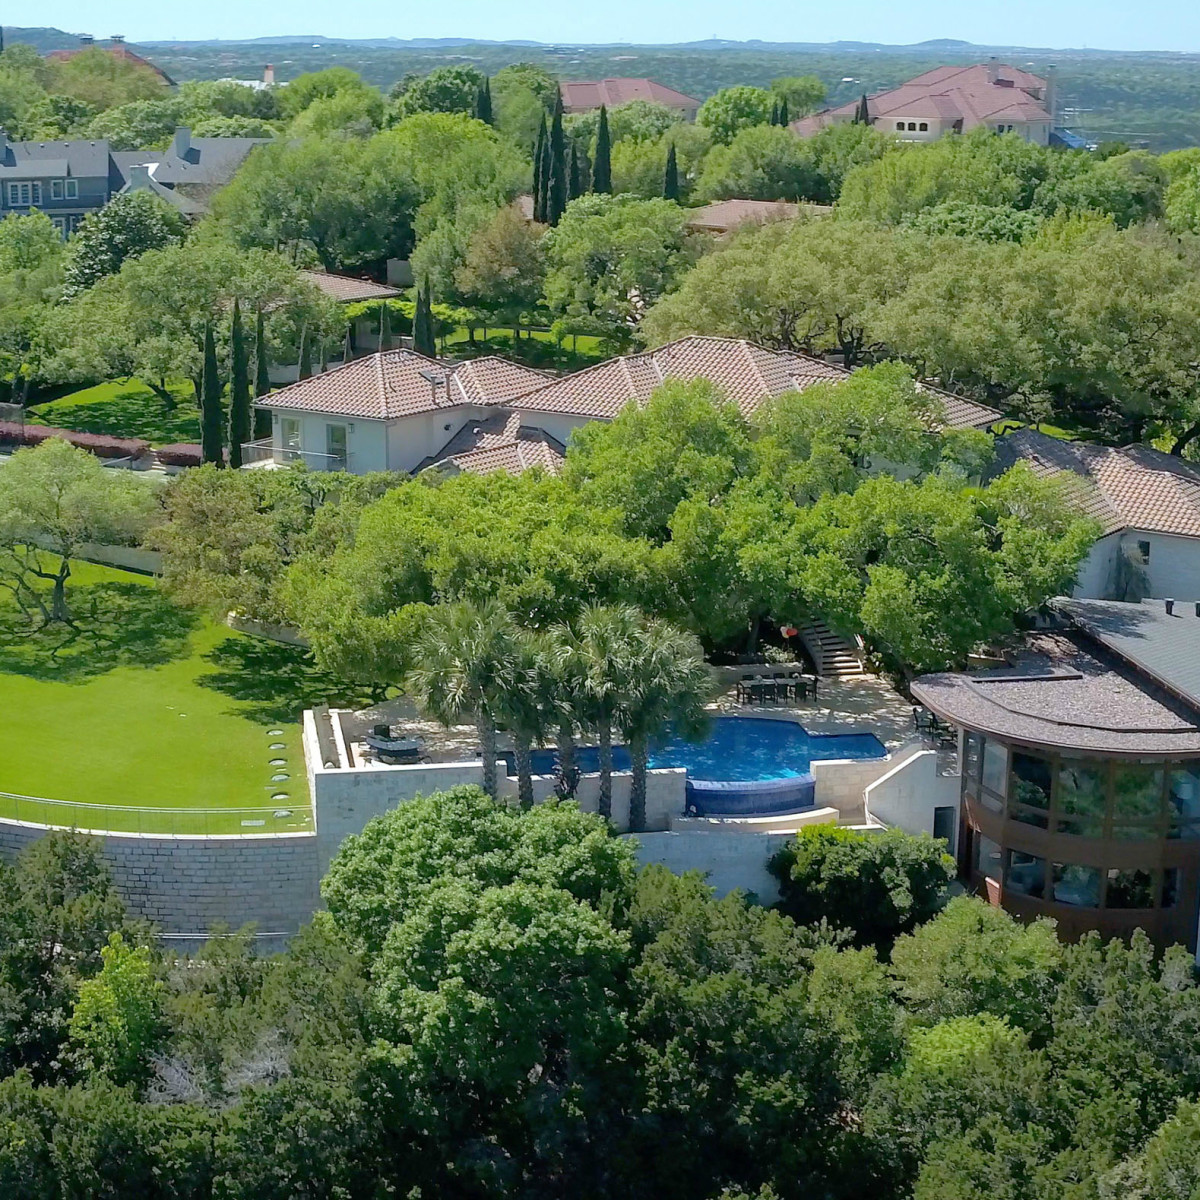 Austin house home 101 Pascal Lane Weslake Rob Roy neighborhood aerial